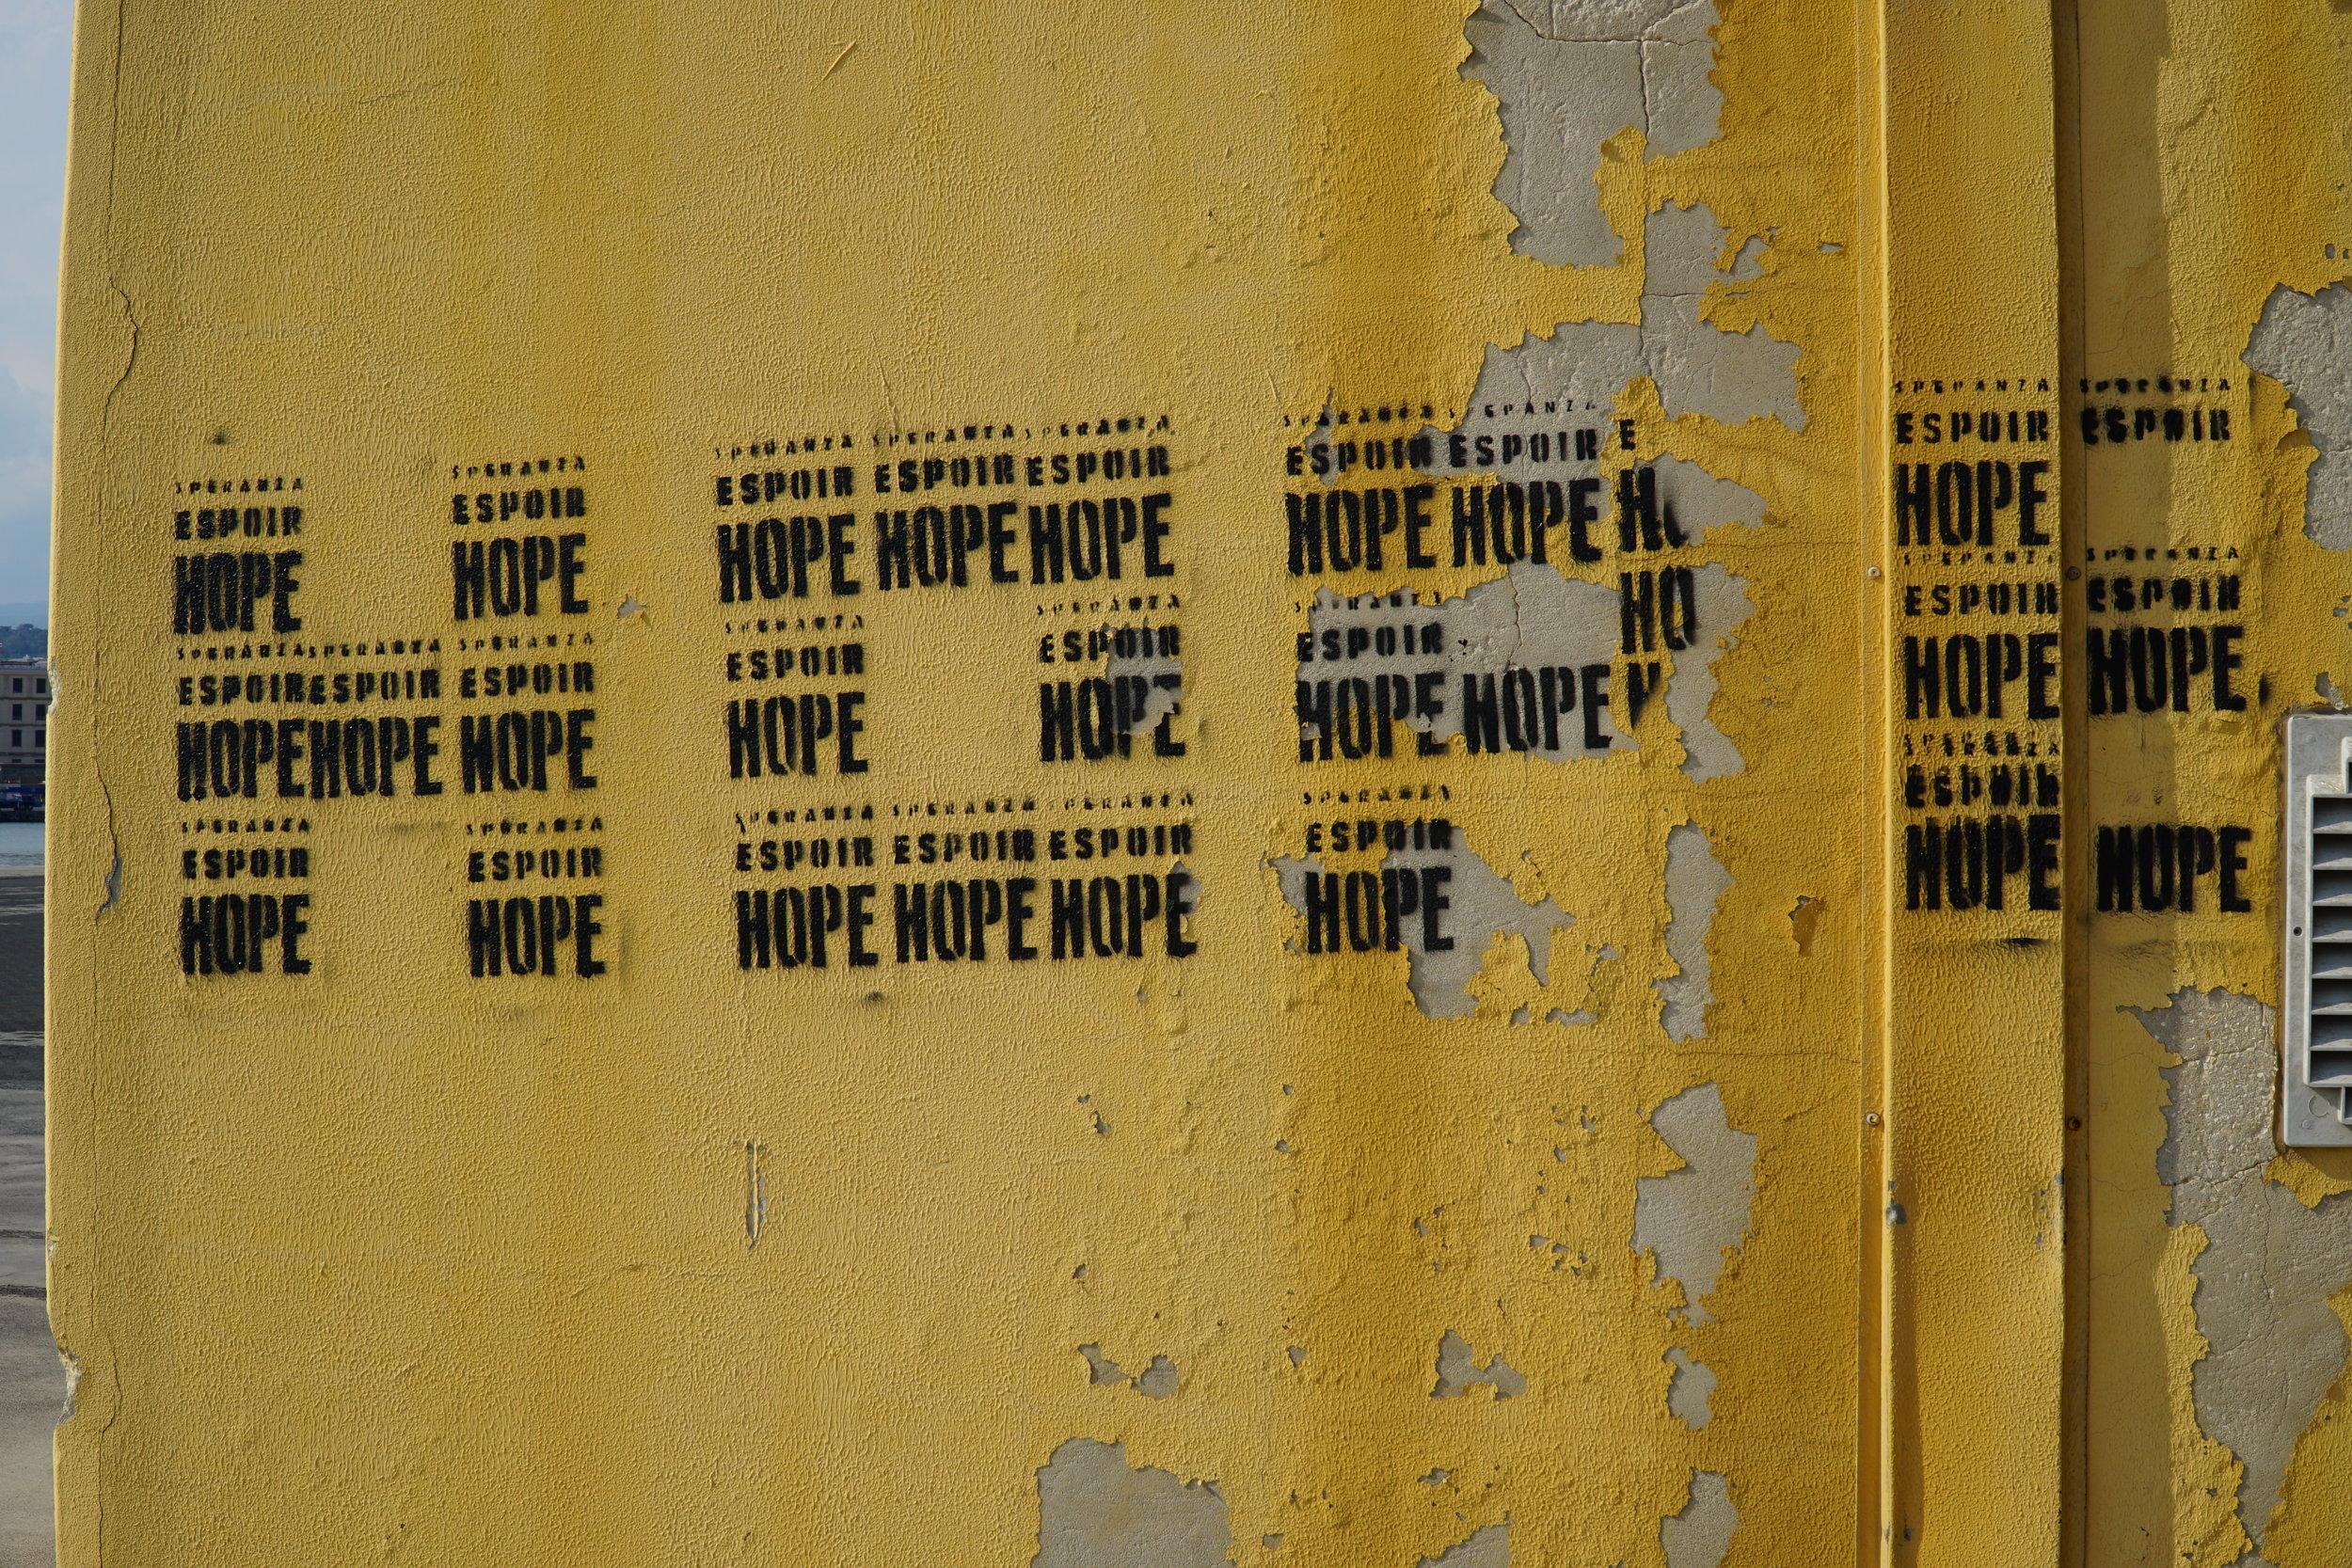 Hope at the port of Catania. Credits: Lauren Heidbrink